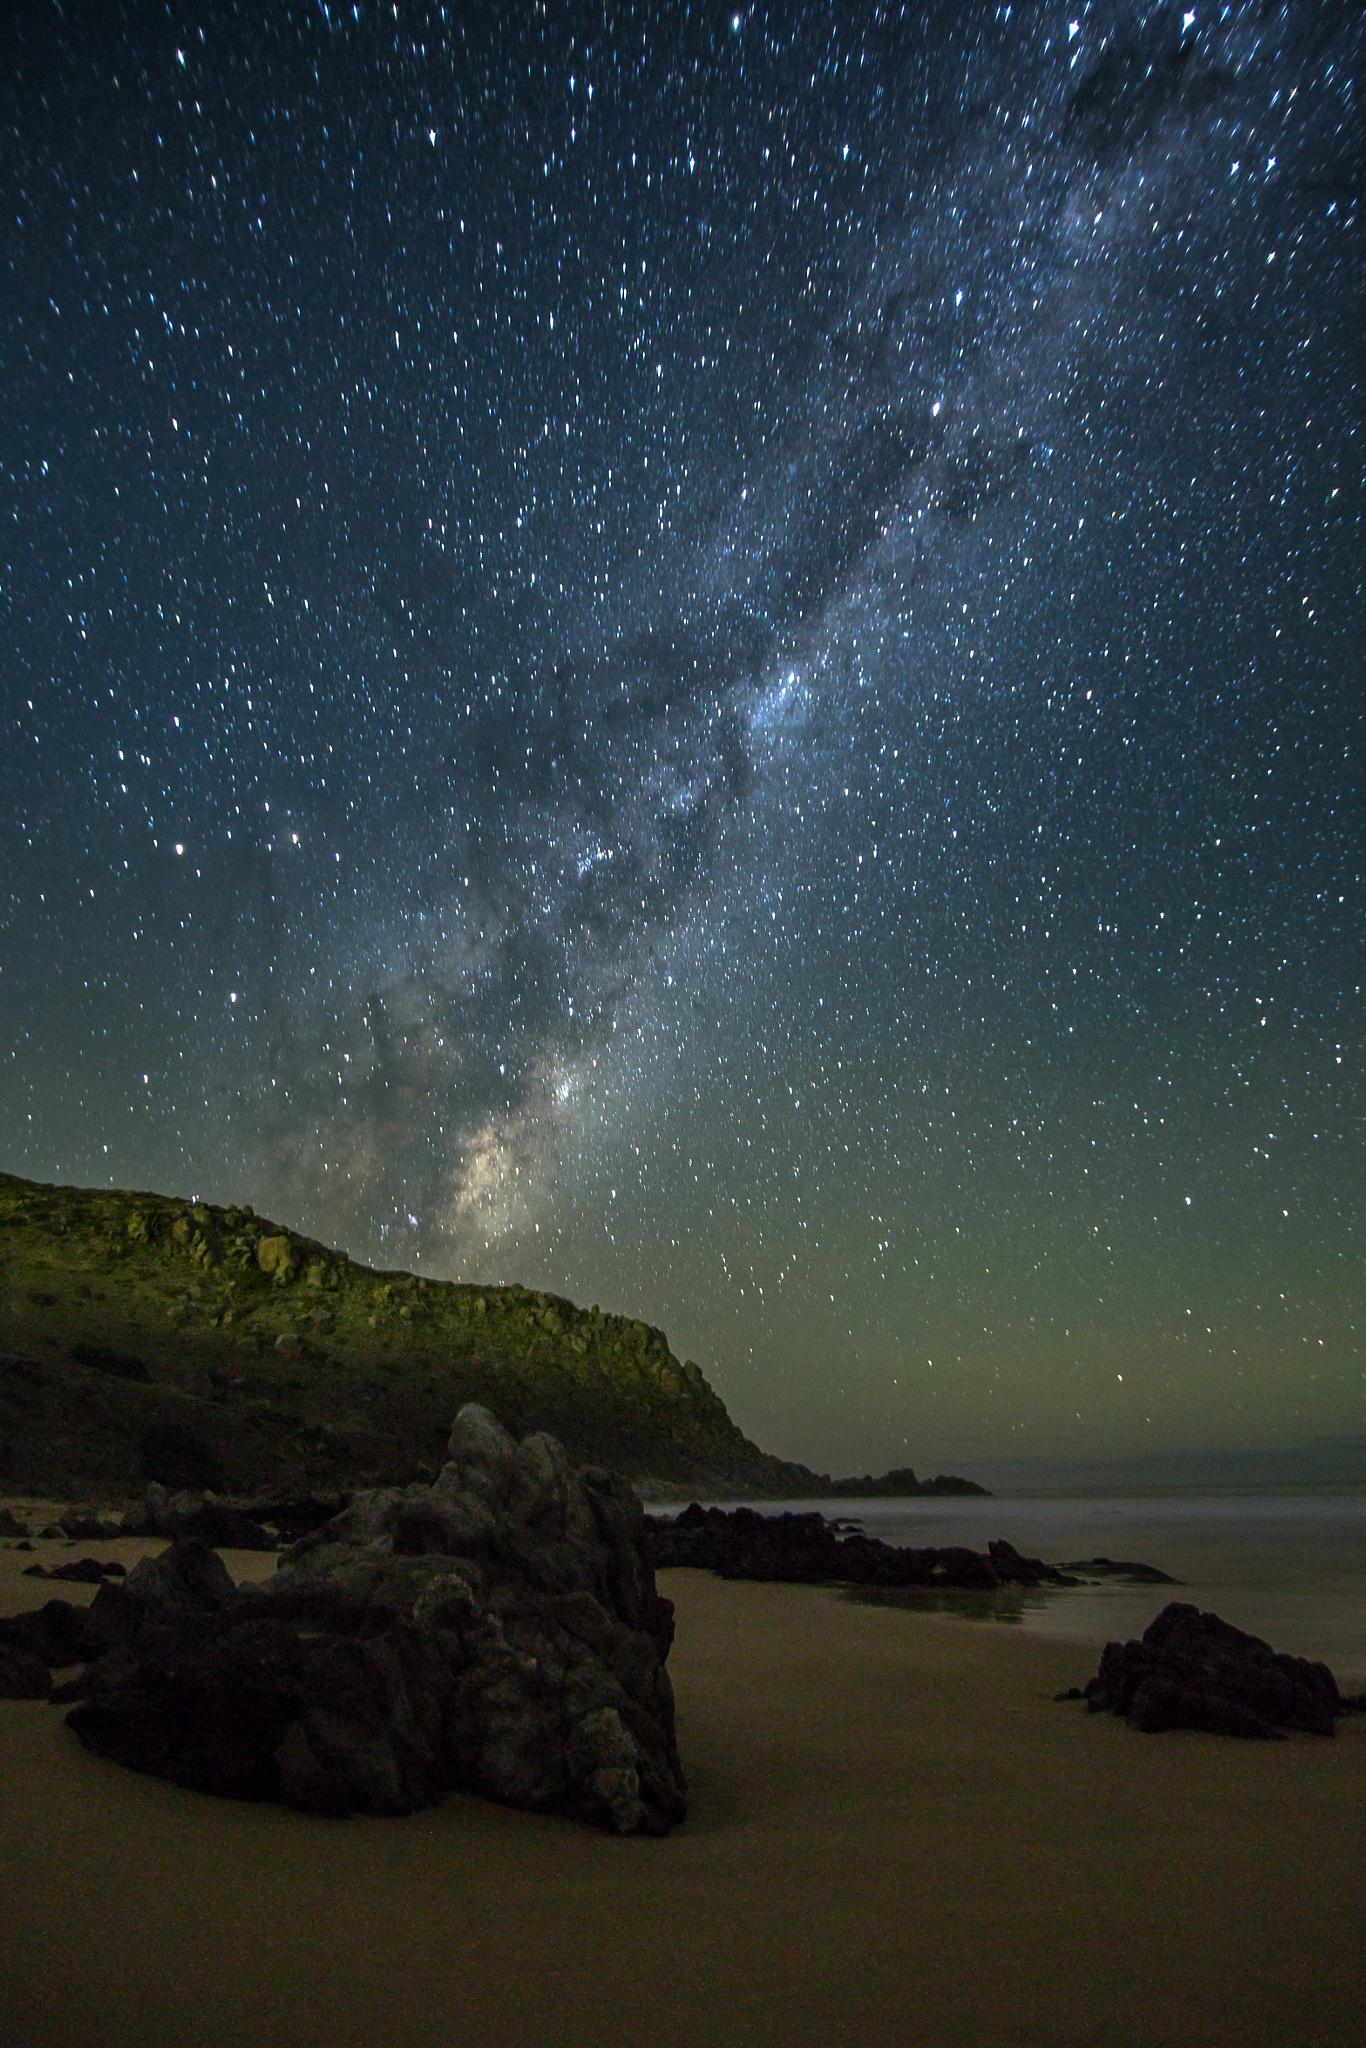 Rocks and Milkyway by Nicole Rix